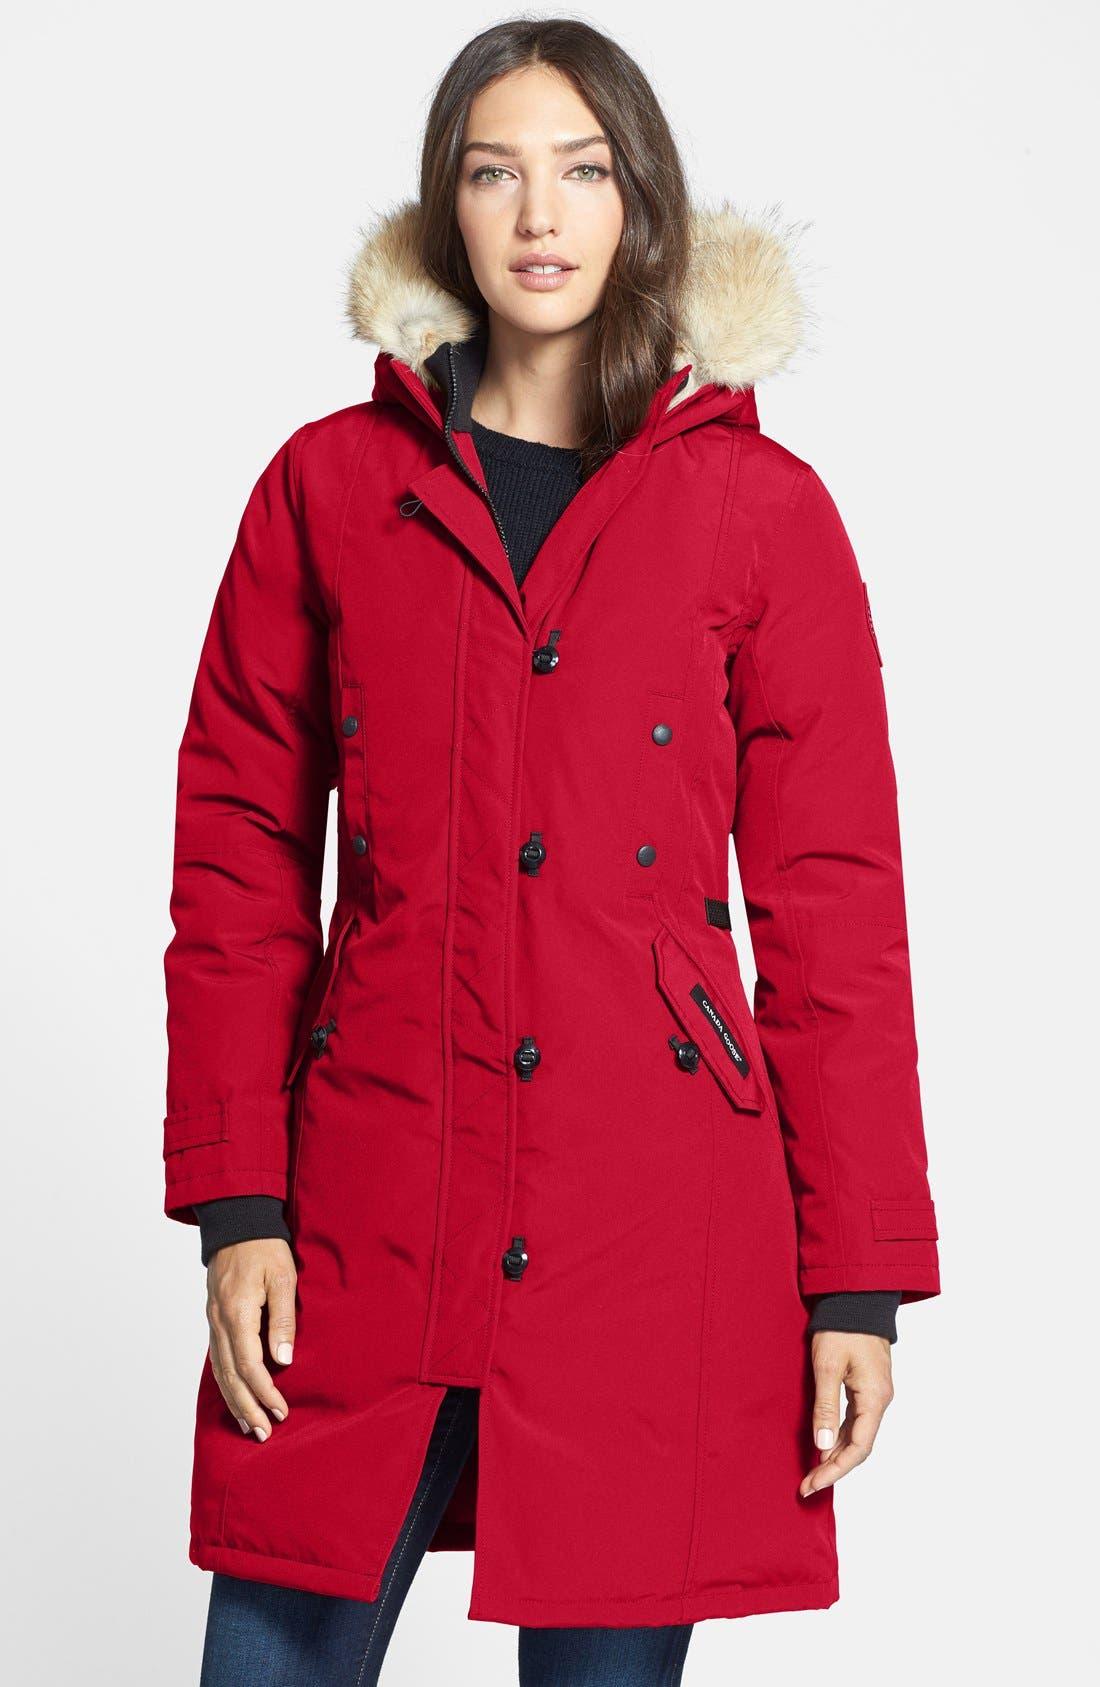 ladies red canada goose jacket